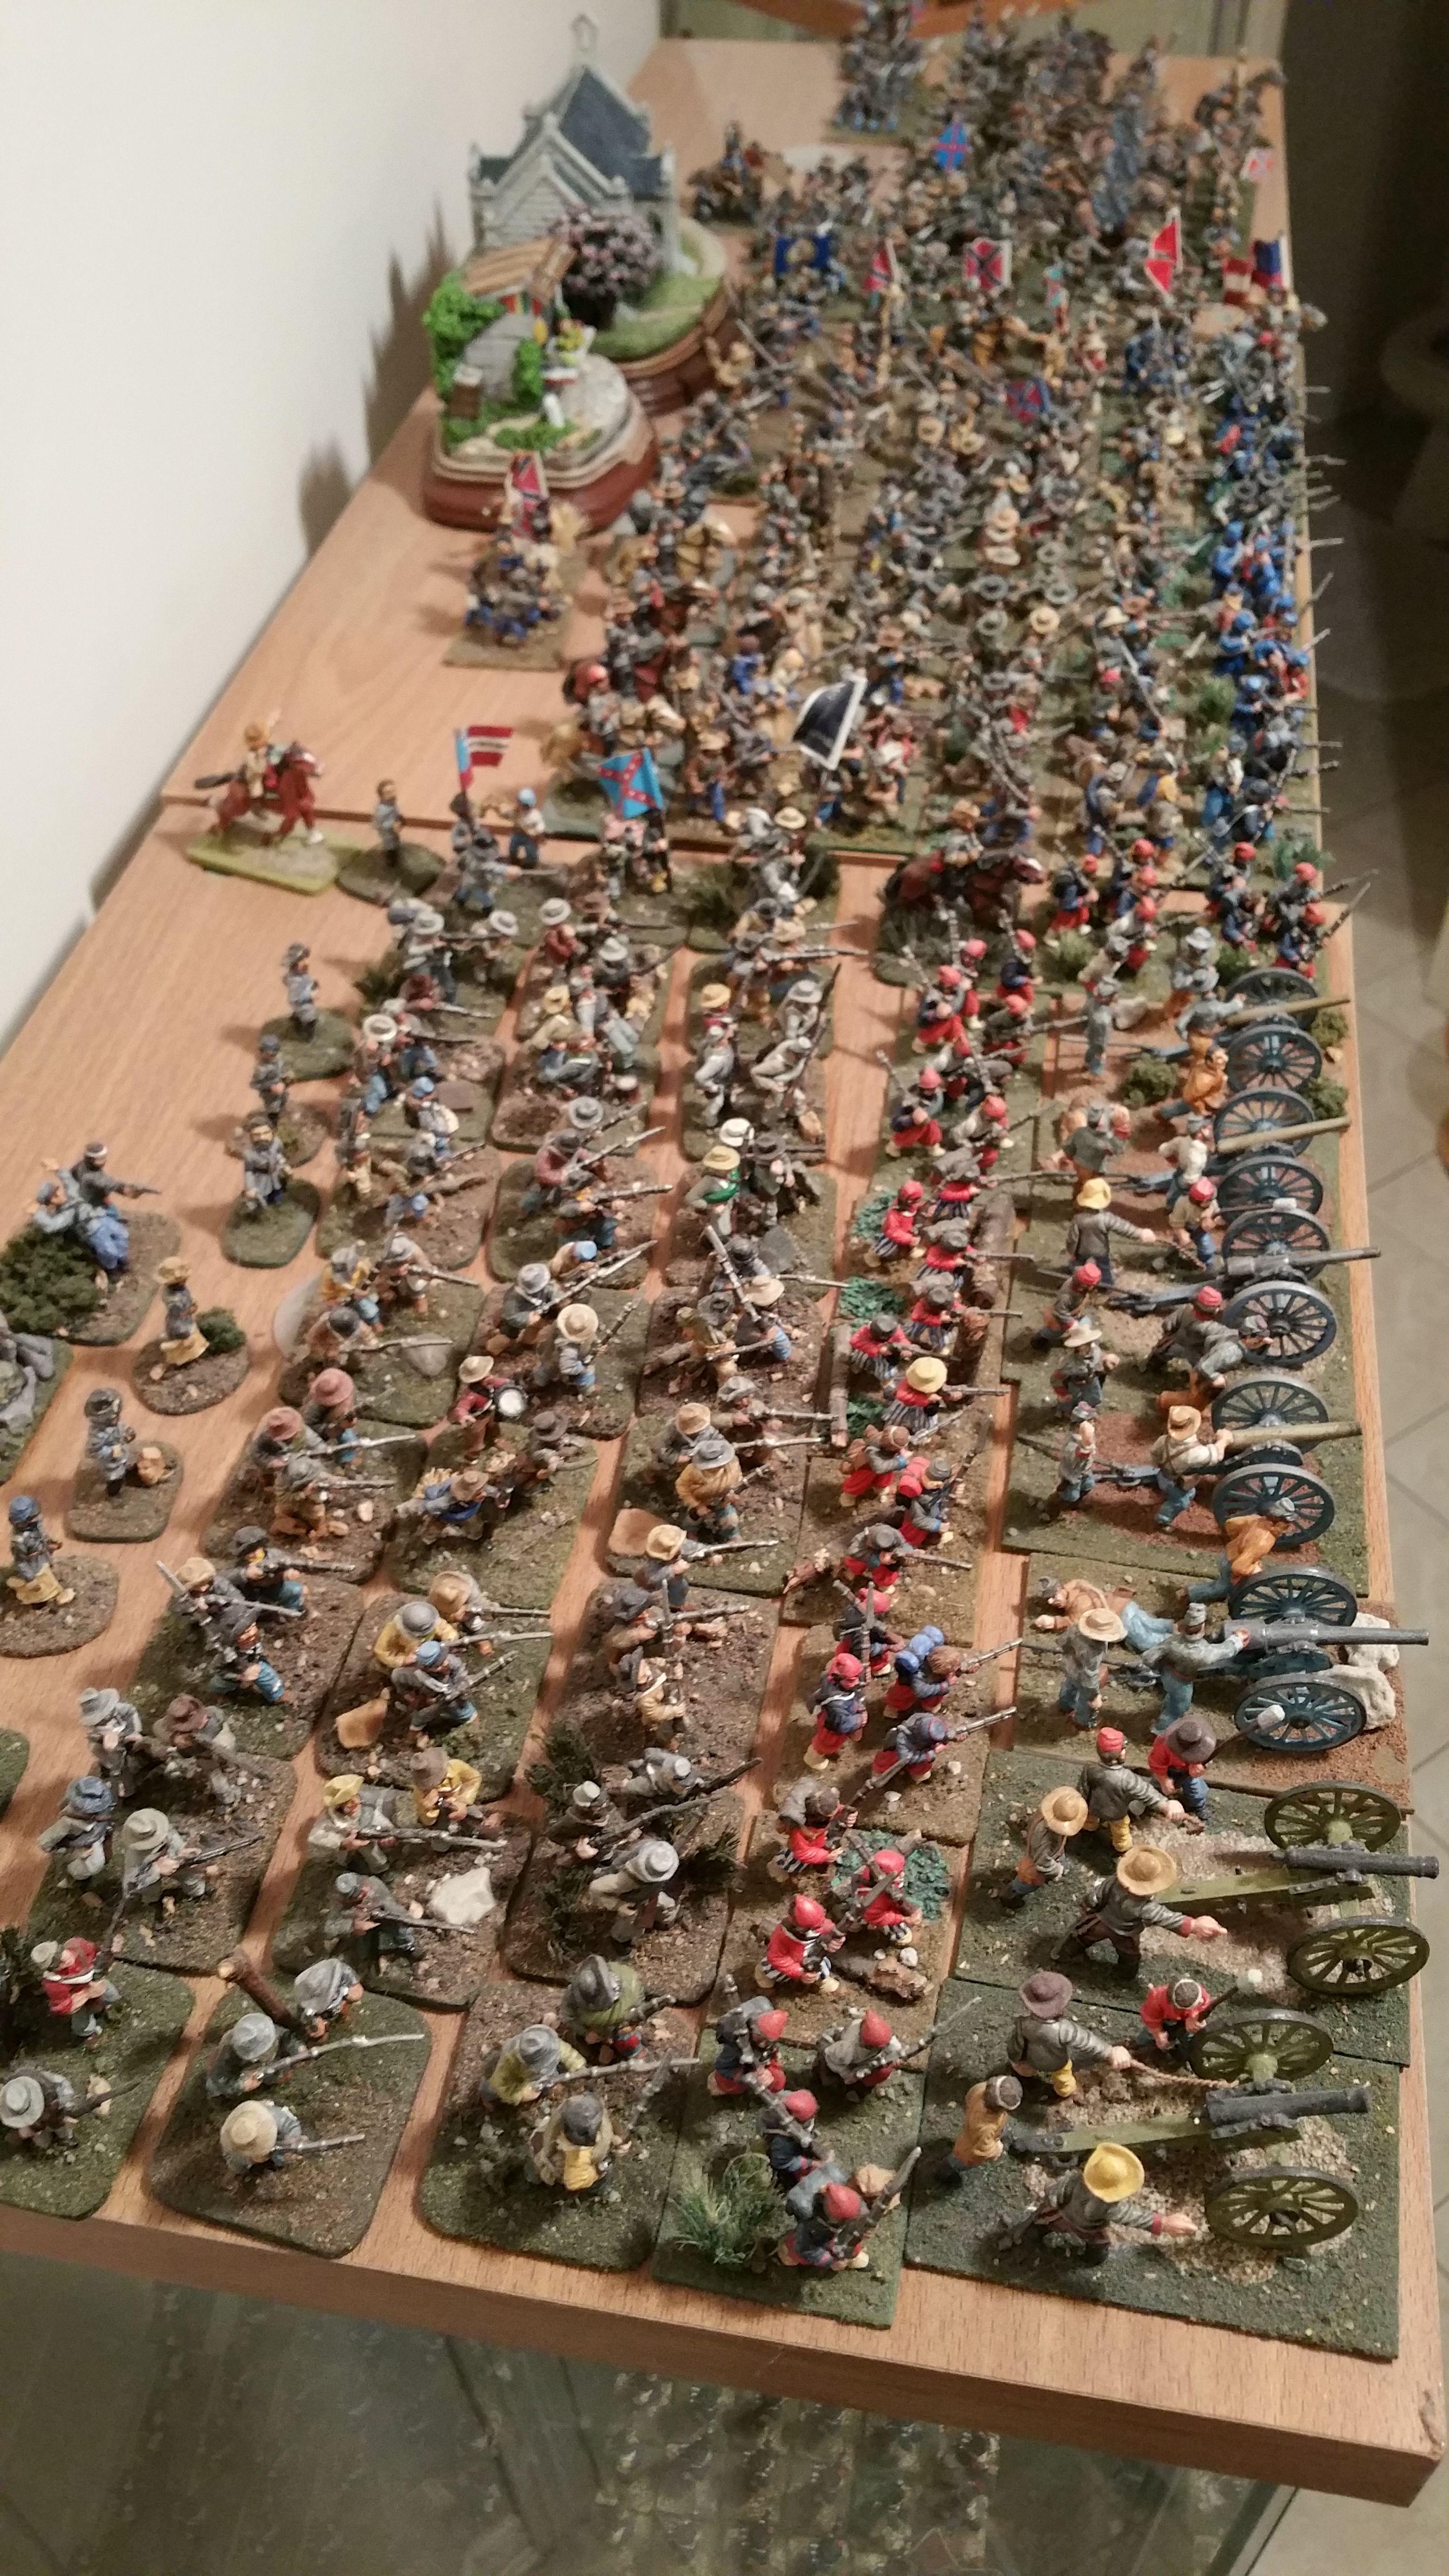 American Civil War 28mm Confederate Army Civil War Art Military Diorama Military Figures